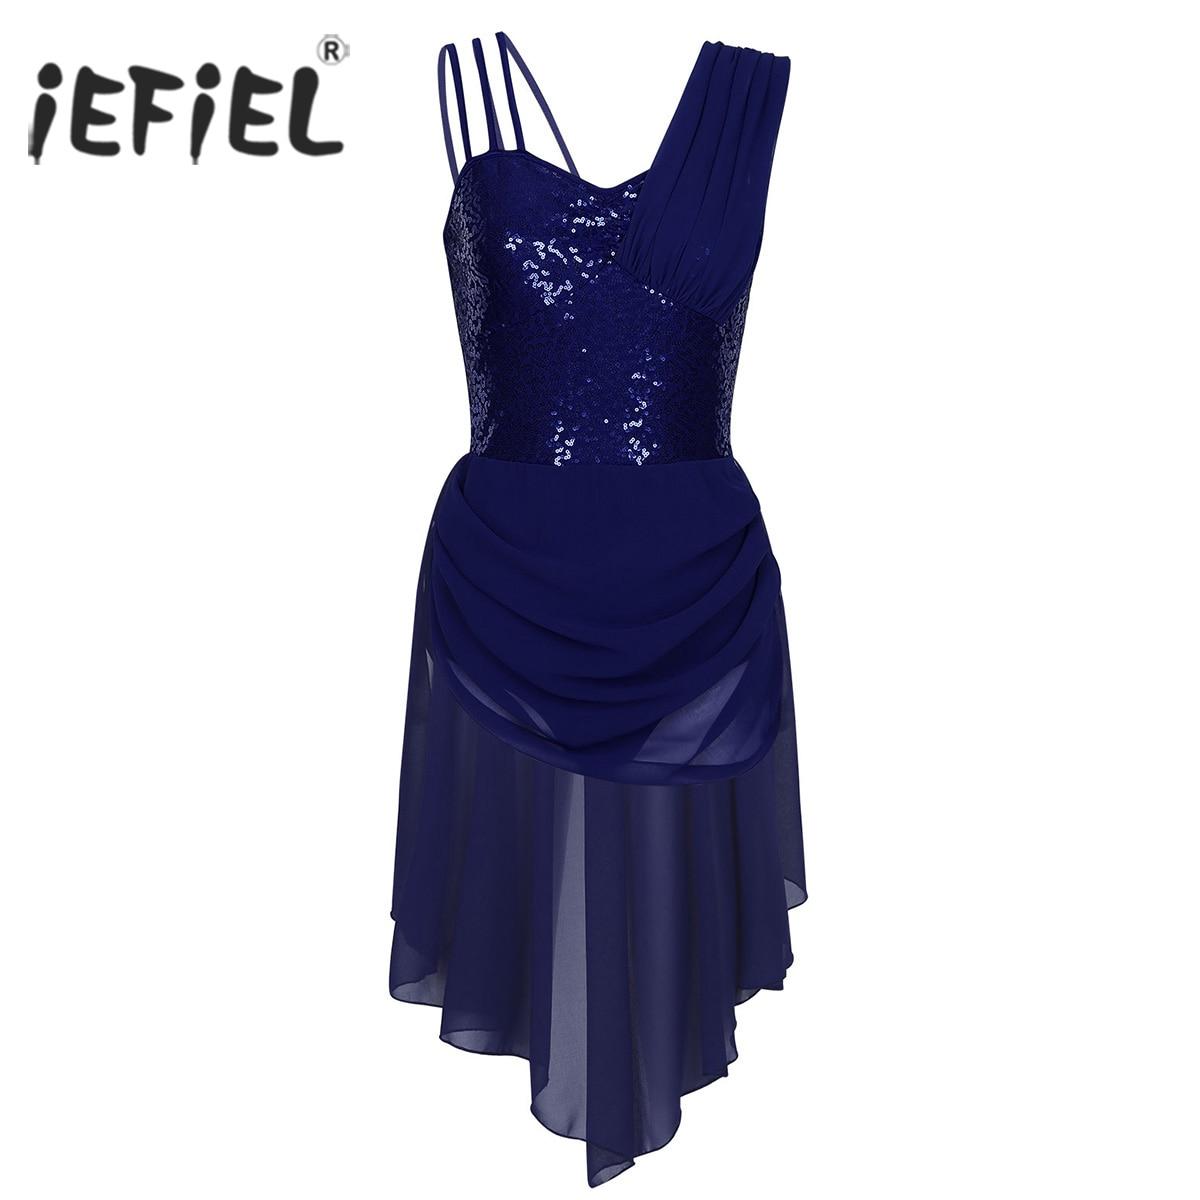 Women Stage Ballerina Adult Spaghetti Straps Performance Sequins Irregular Chiffon Ballet Dancewear Gymnastics Leotard Dress